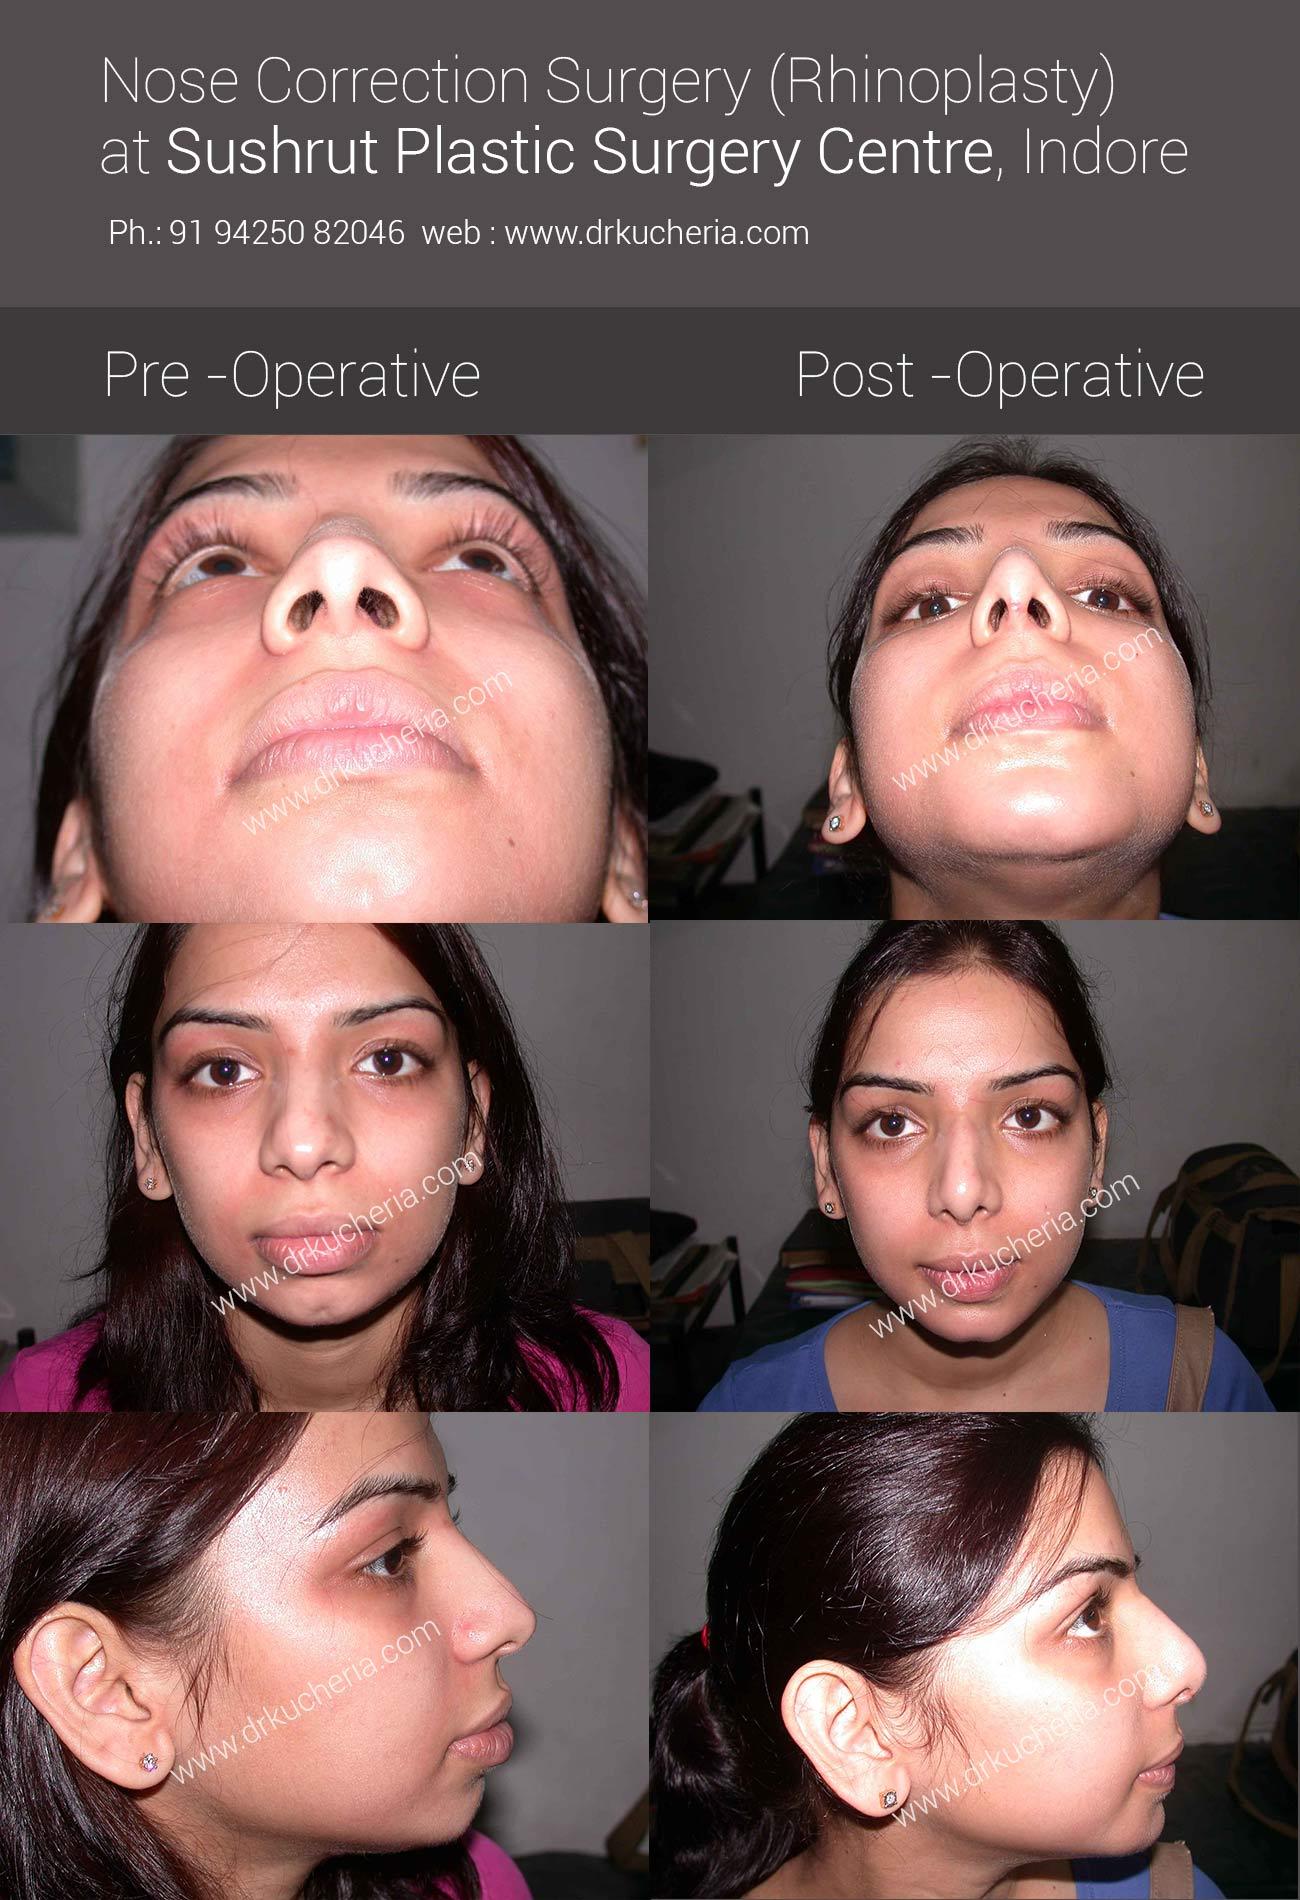 Nose-Correction-Surgery-Rhinoplasty-at-Sushrut-Plastic-Surgery-Centre-Indore-2013